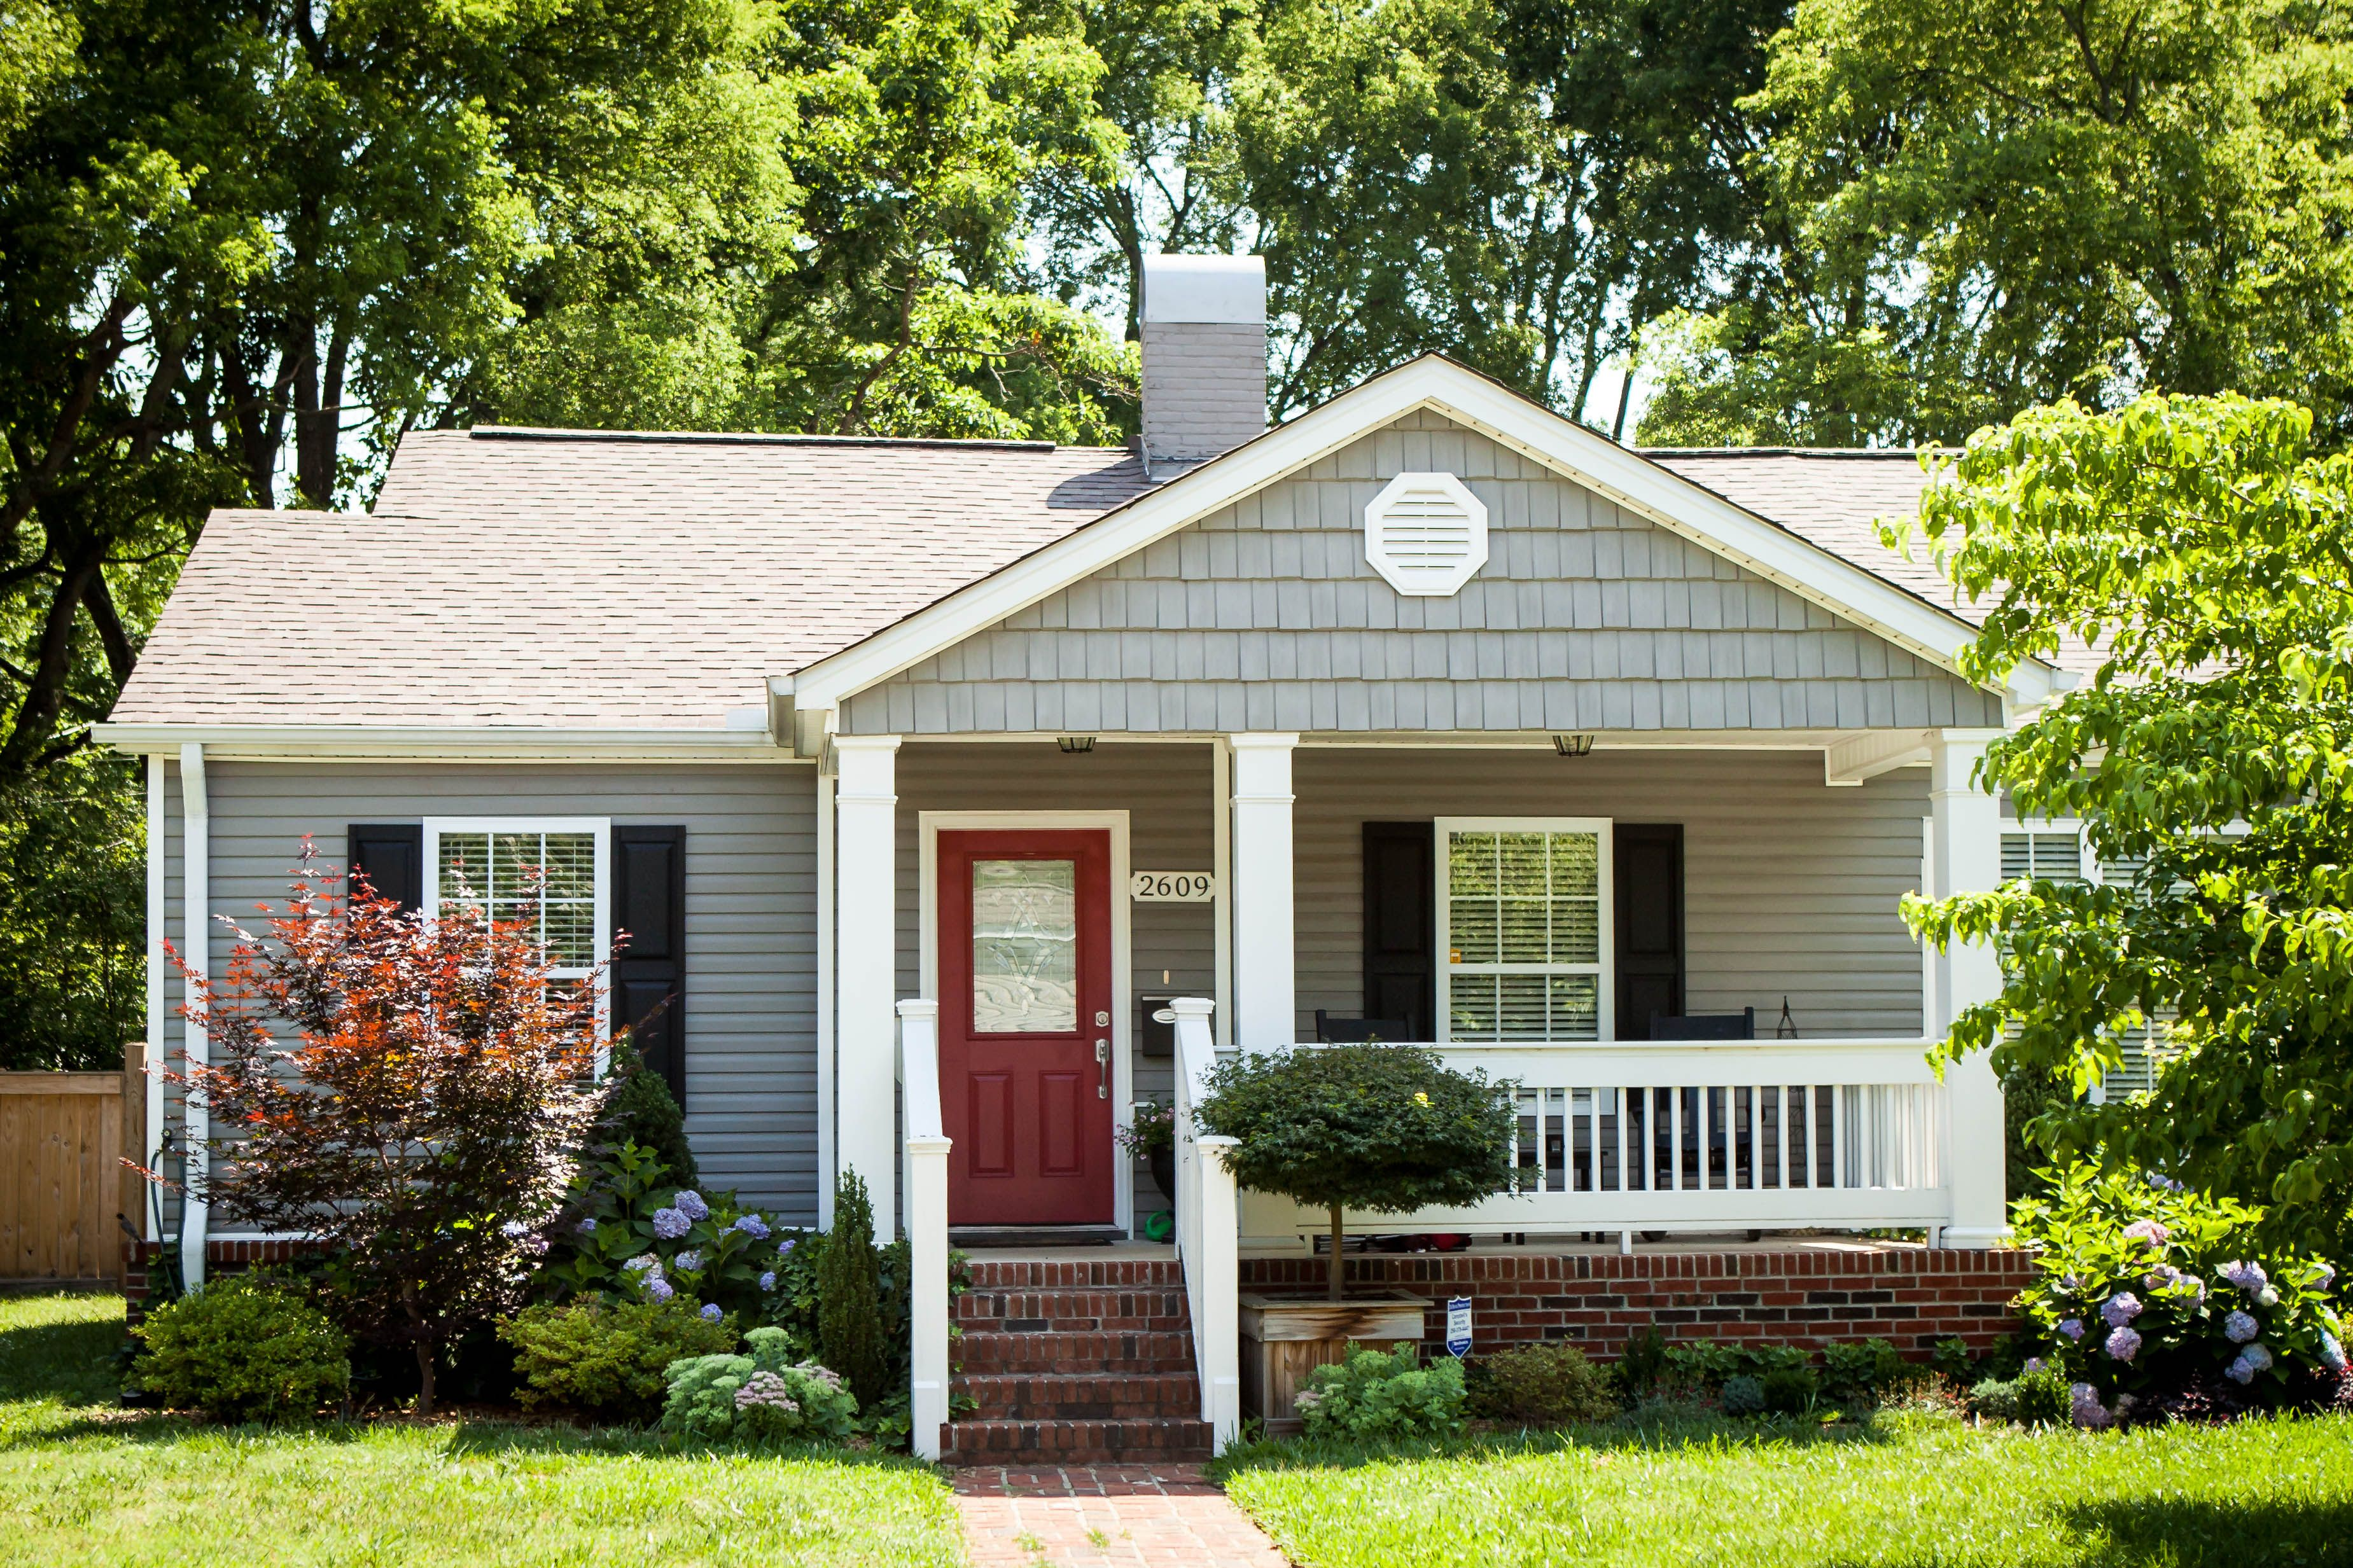 2b6b866bf6e42ca2331c4cff7ee79c9e - Better Homes And Gardens Huntsville Al